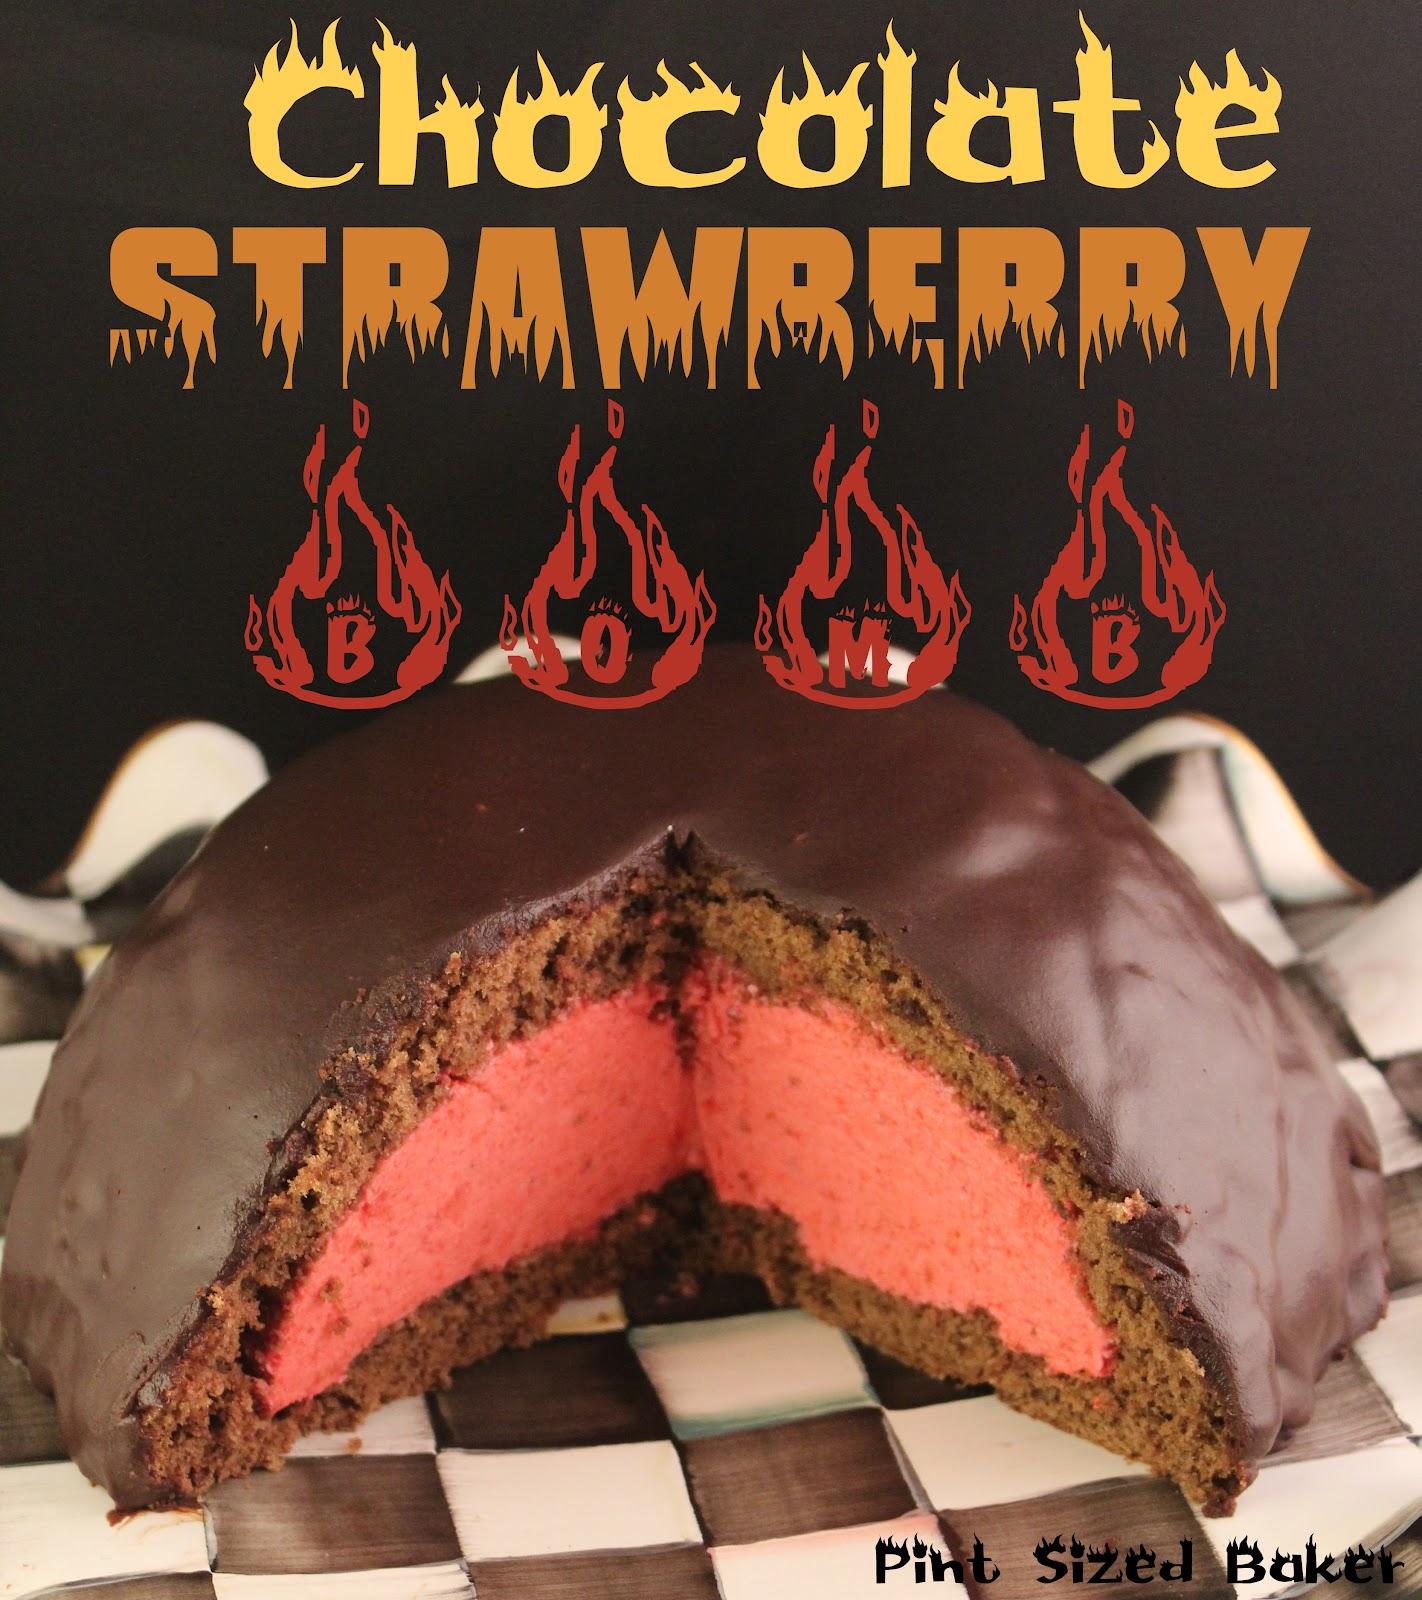 Chocolate Strawberry Bomb Cake